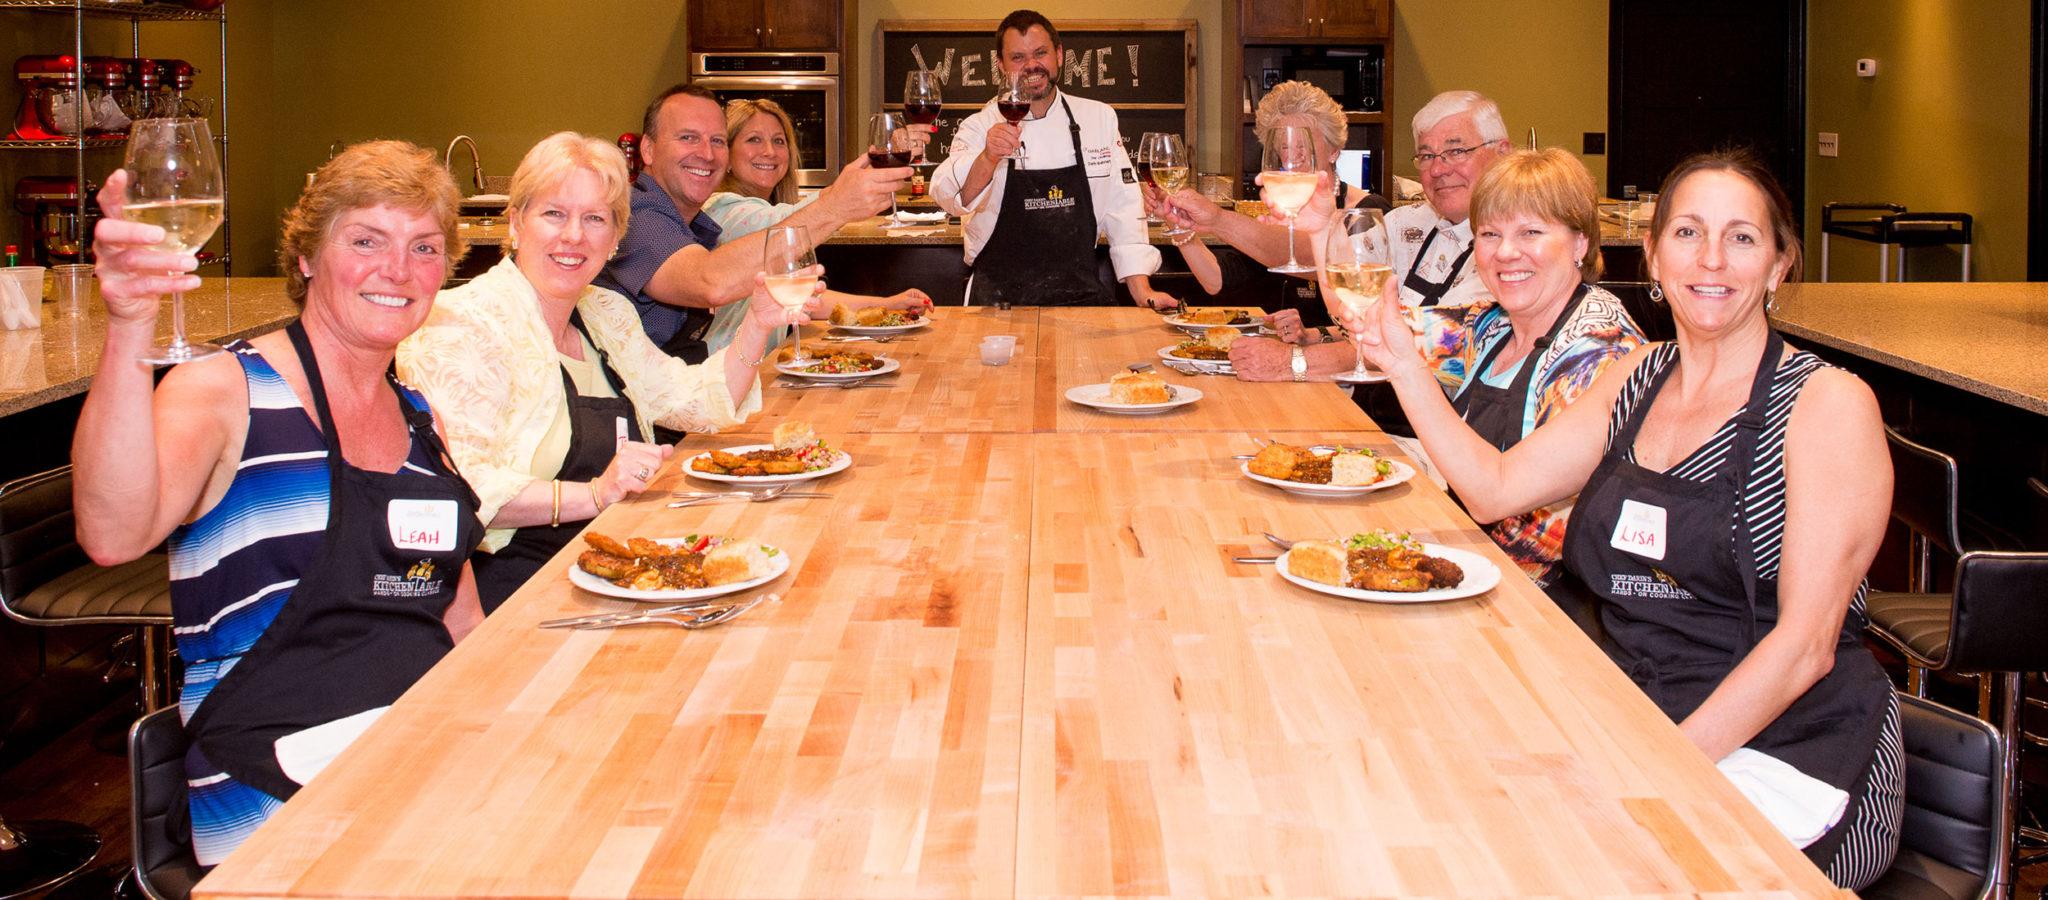 Hands-on Cooking Classes in Savannah, GA